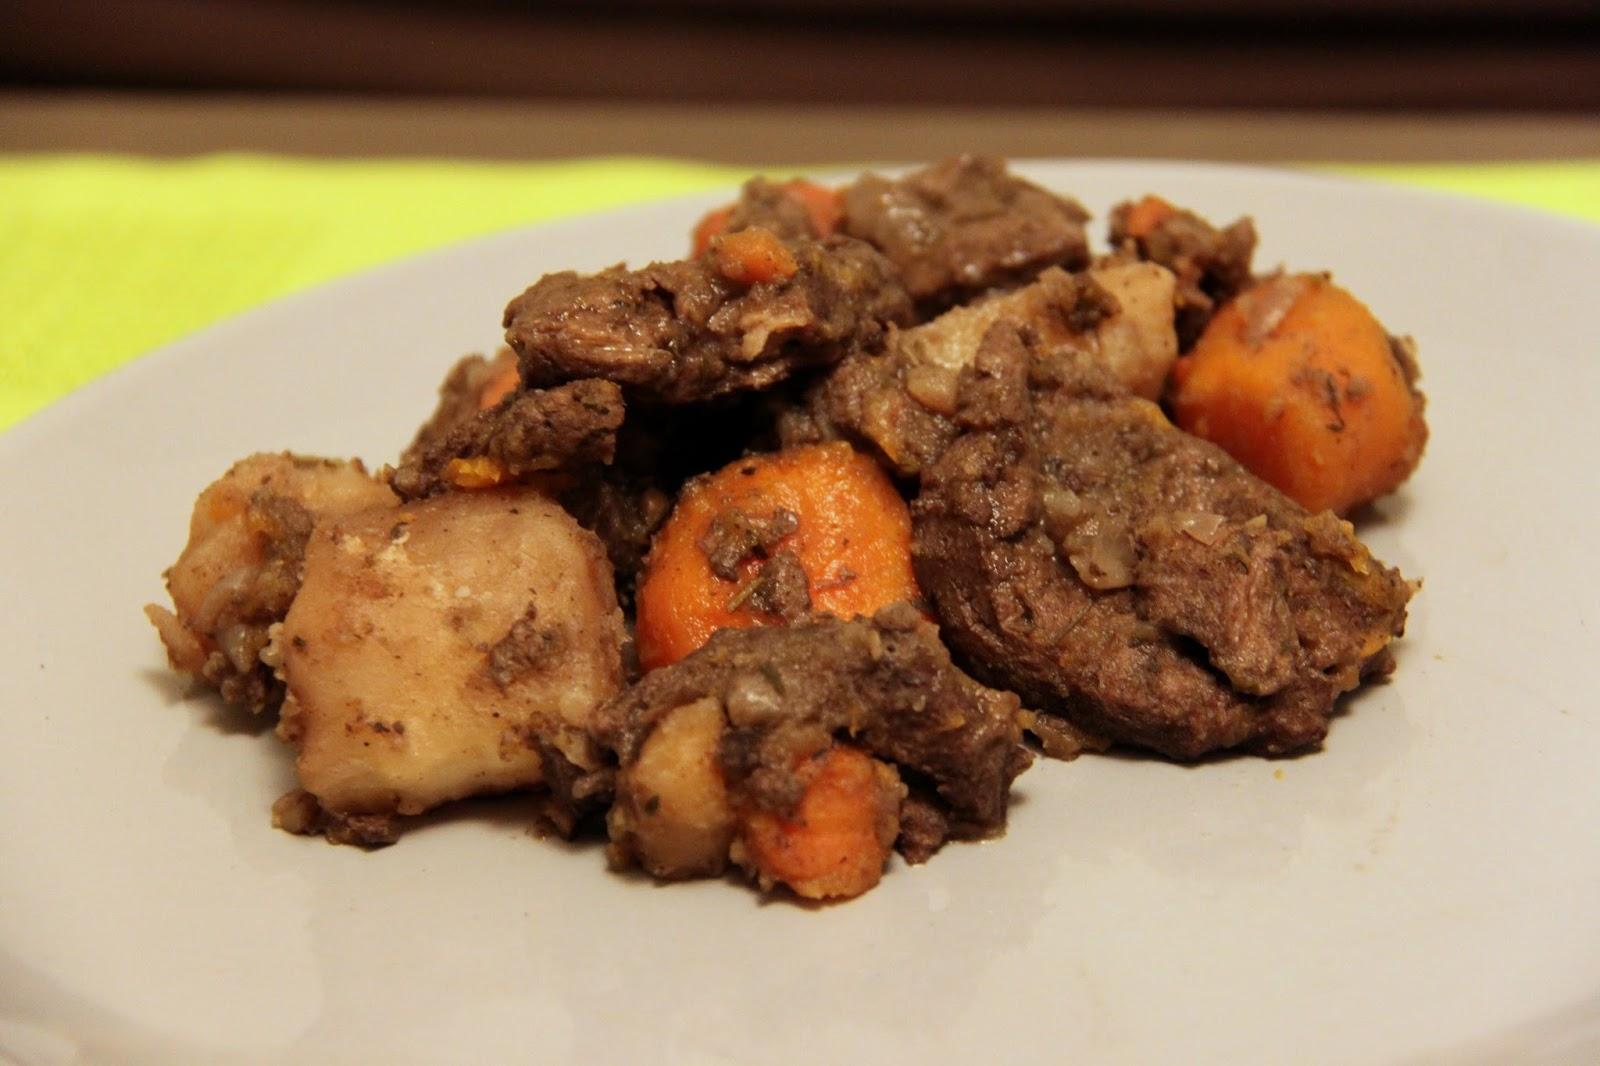 Recettes v g tales v ganes bourguignon v gane avec for Proteine de soja